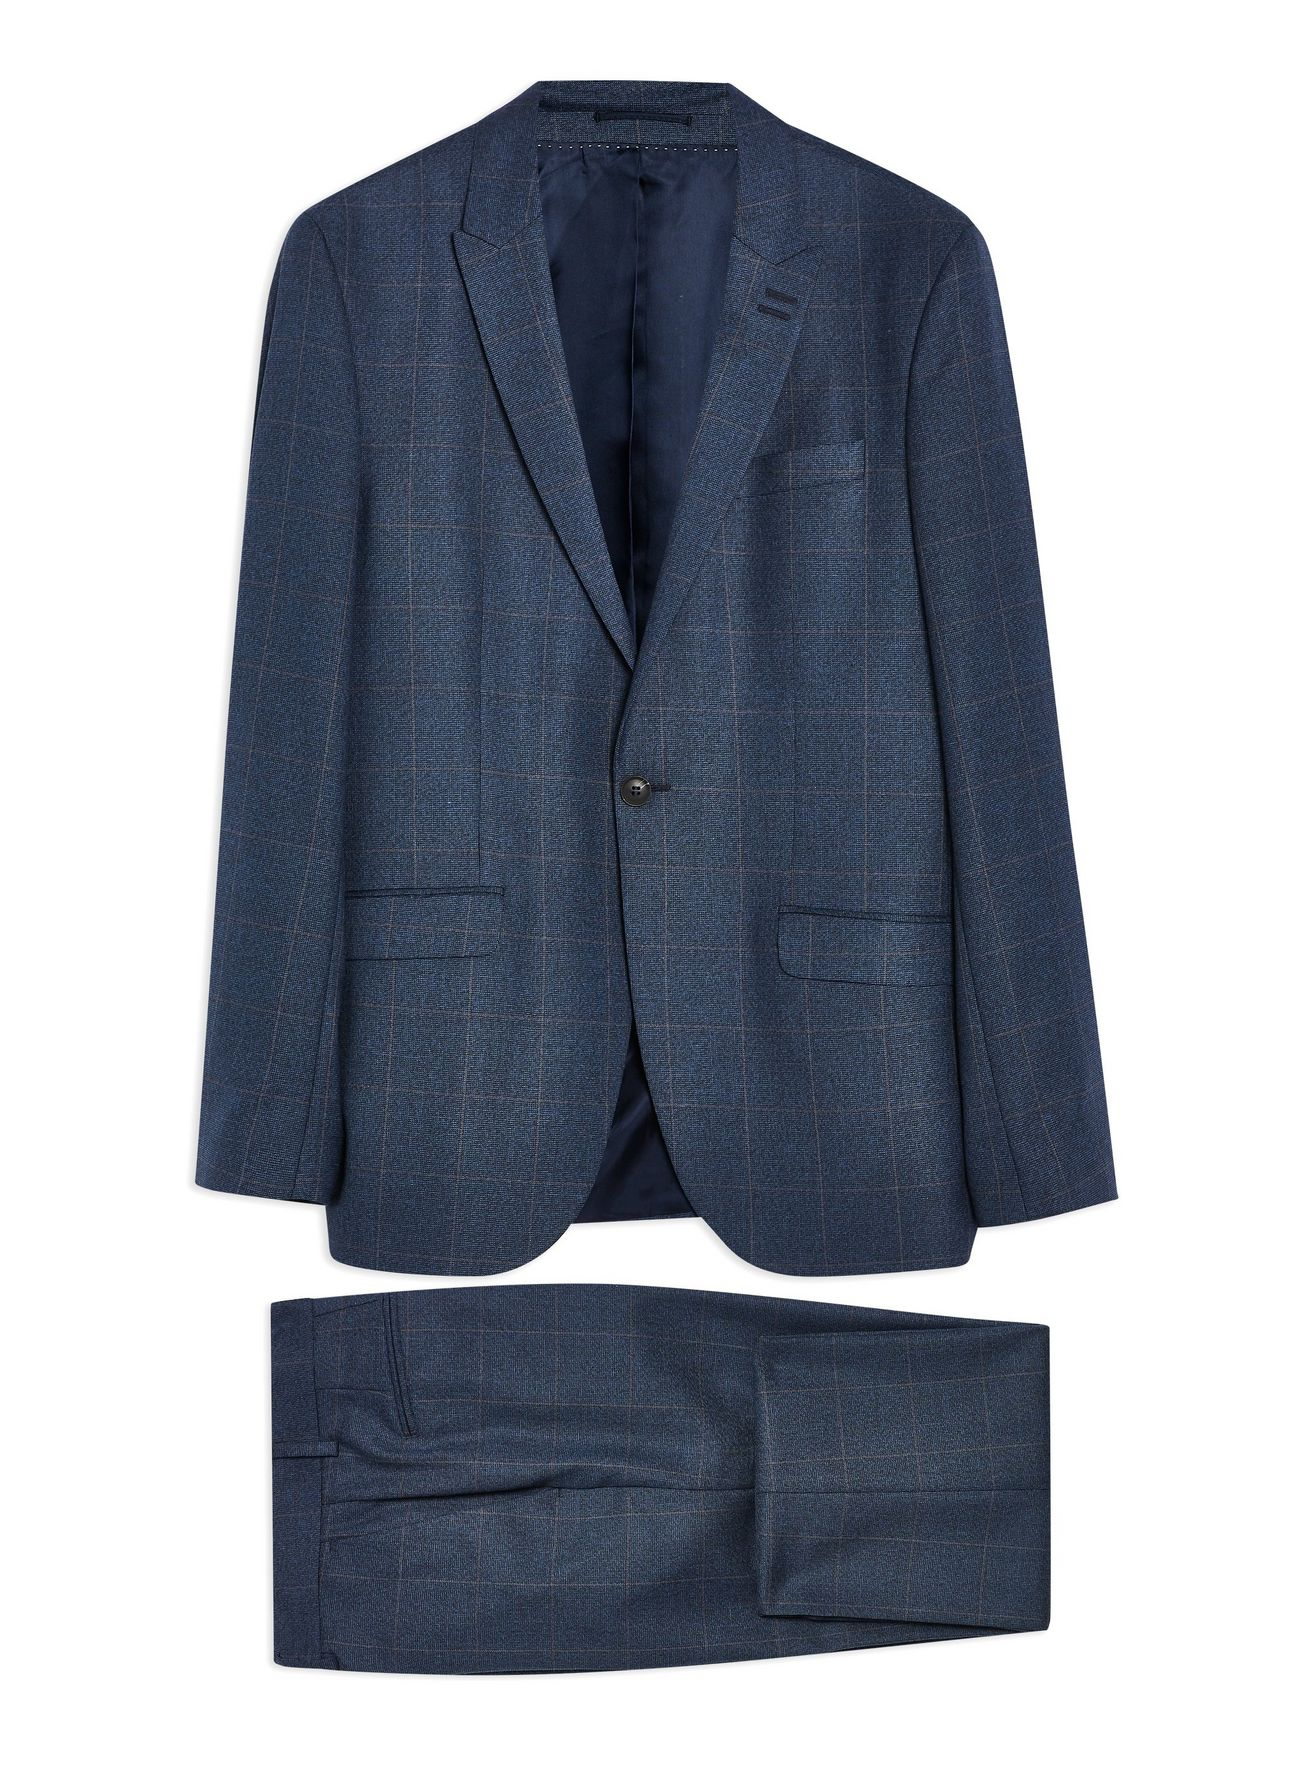 Navy Windowpane Suit